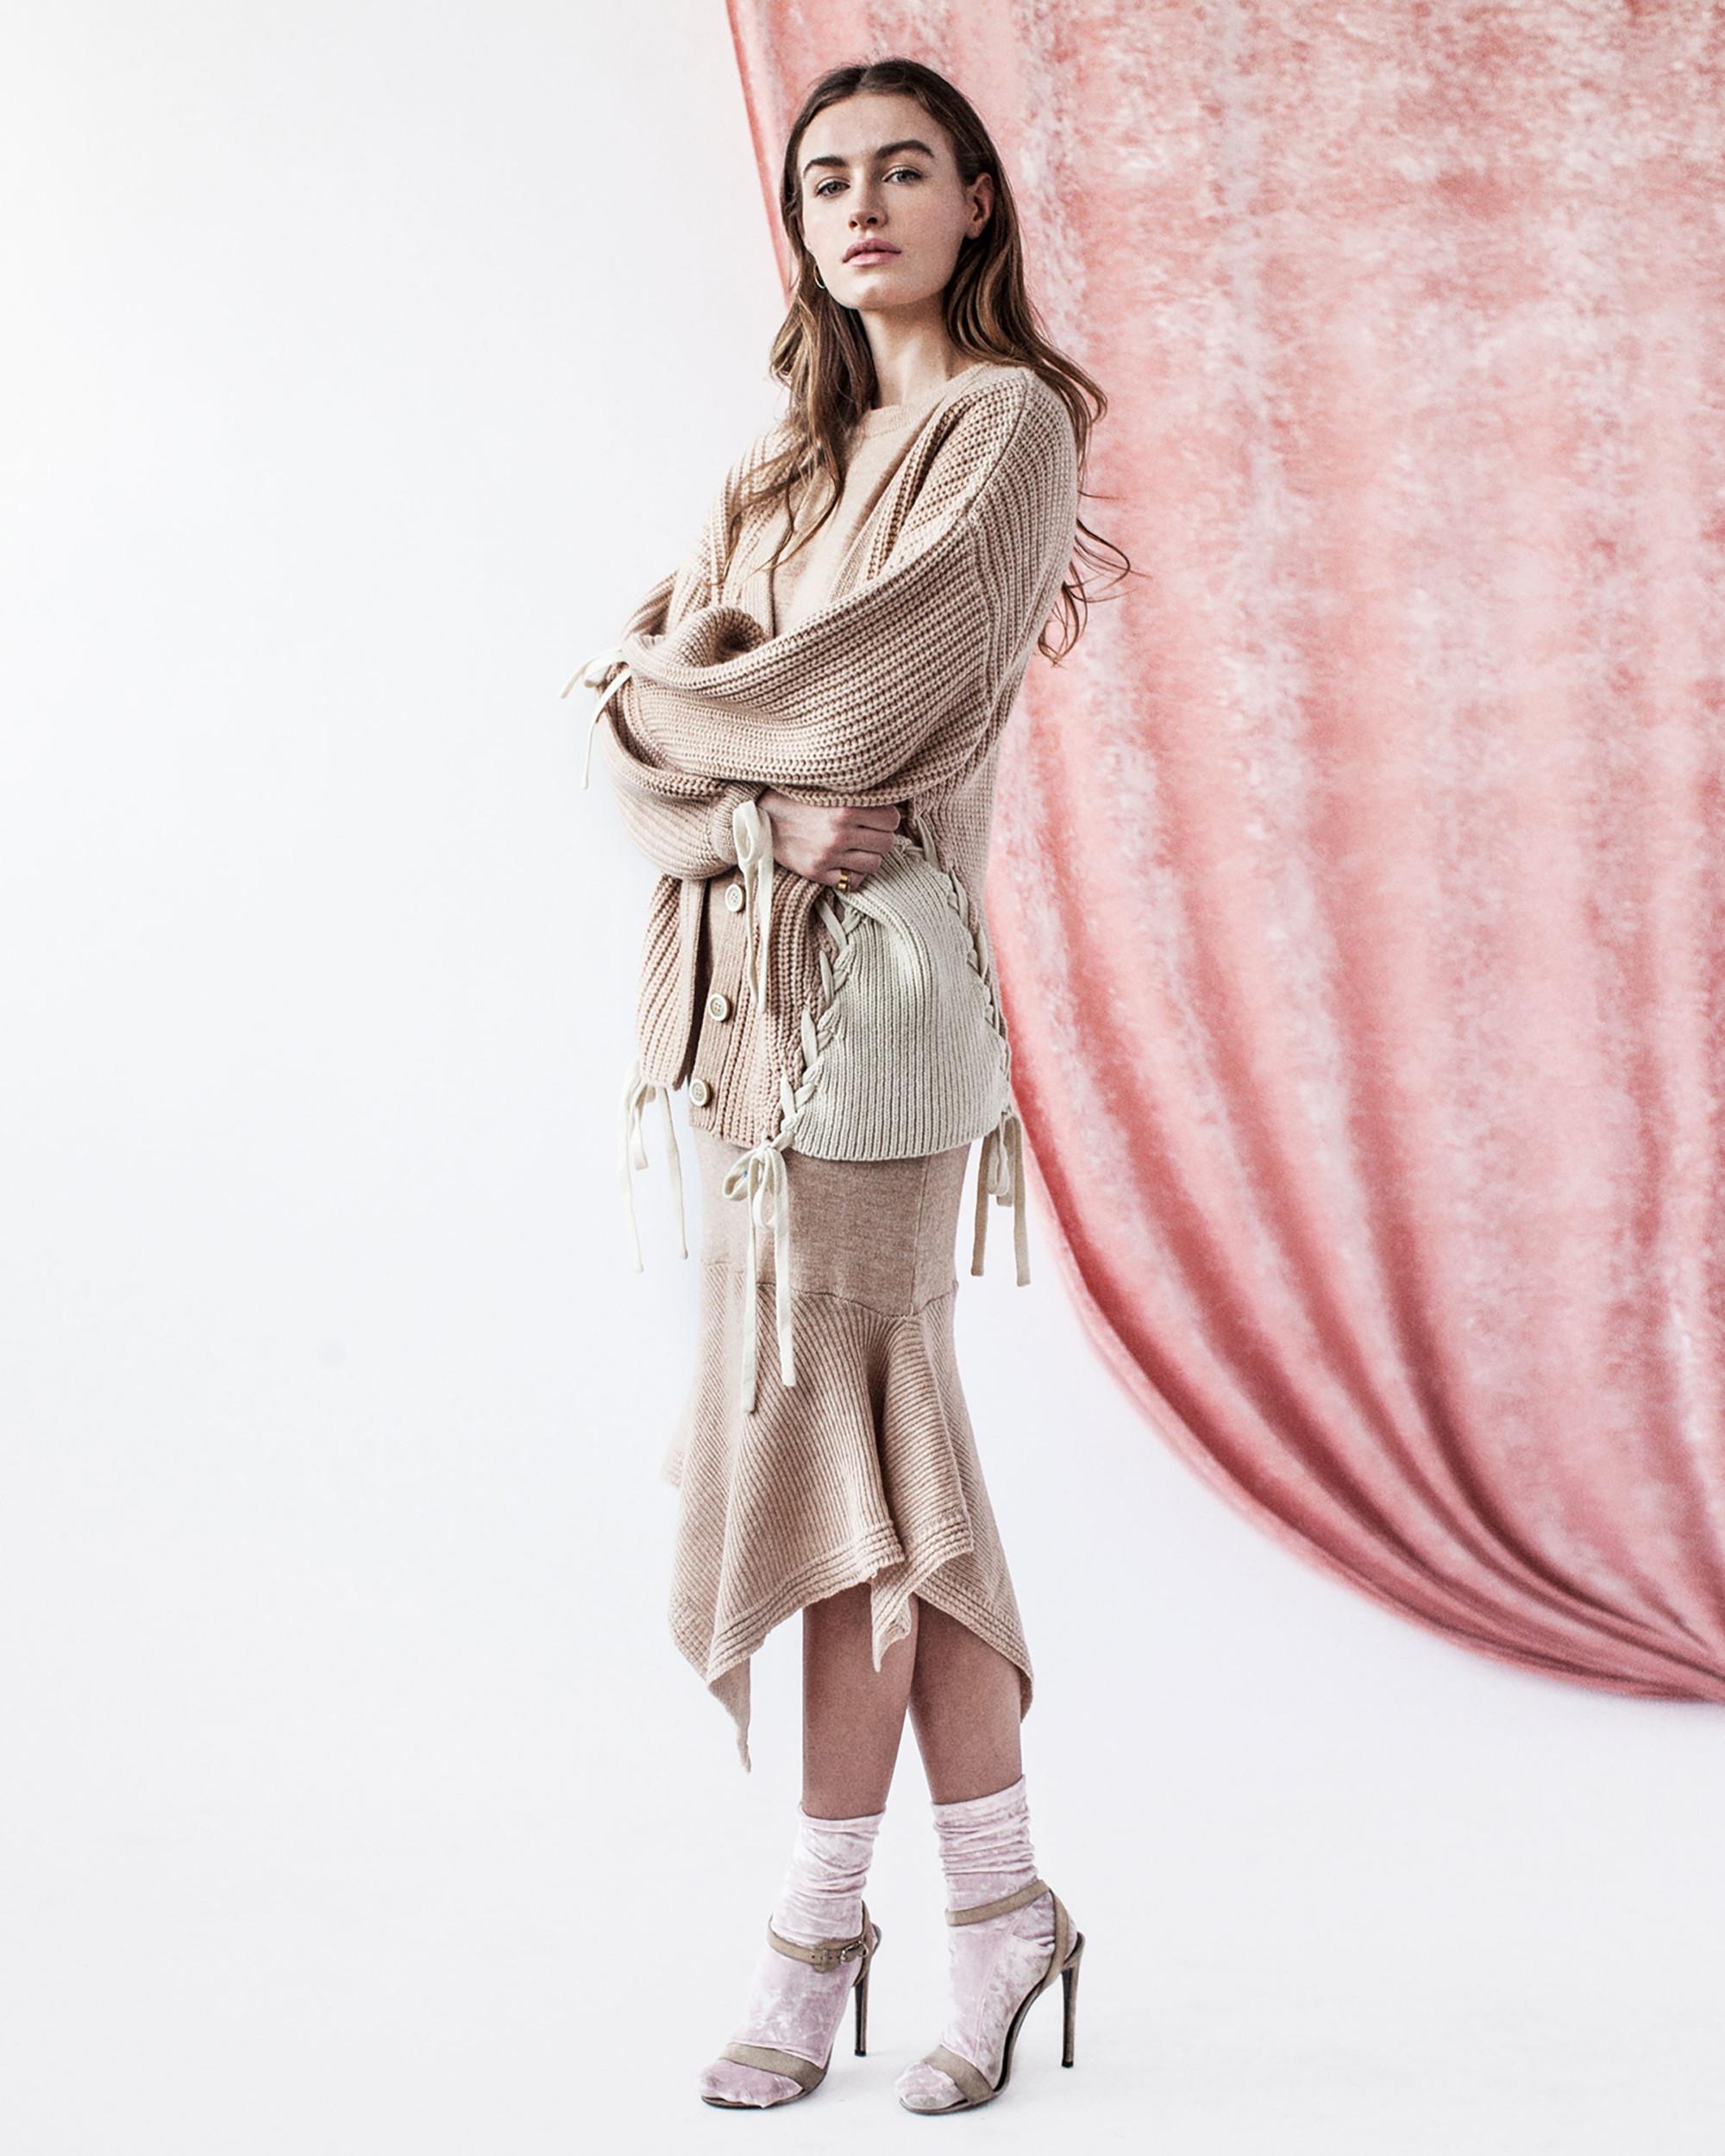 Tabula Rasa модный кардиган 2019 светло-бежевого цвета со шнуровкой